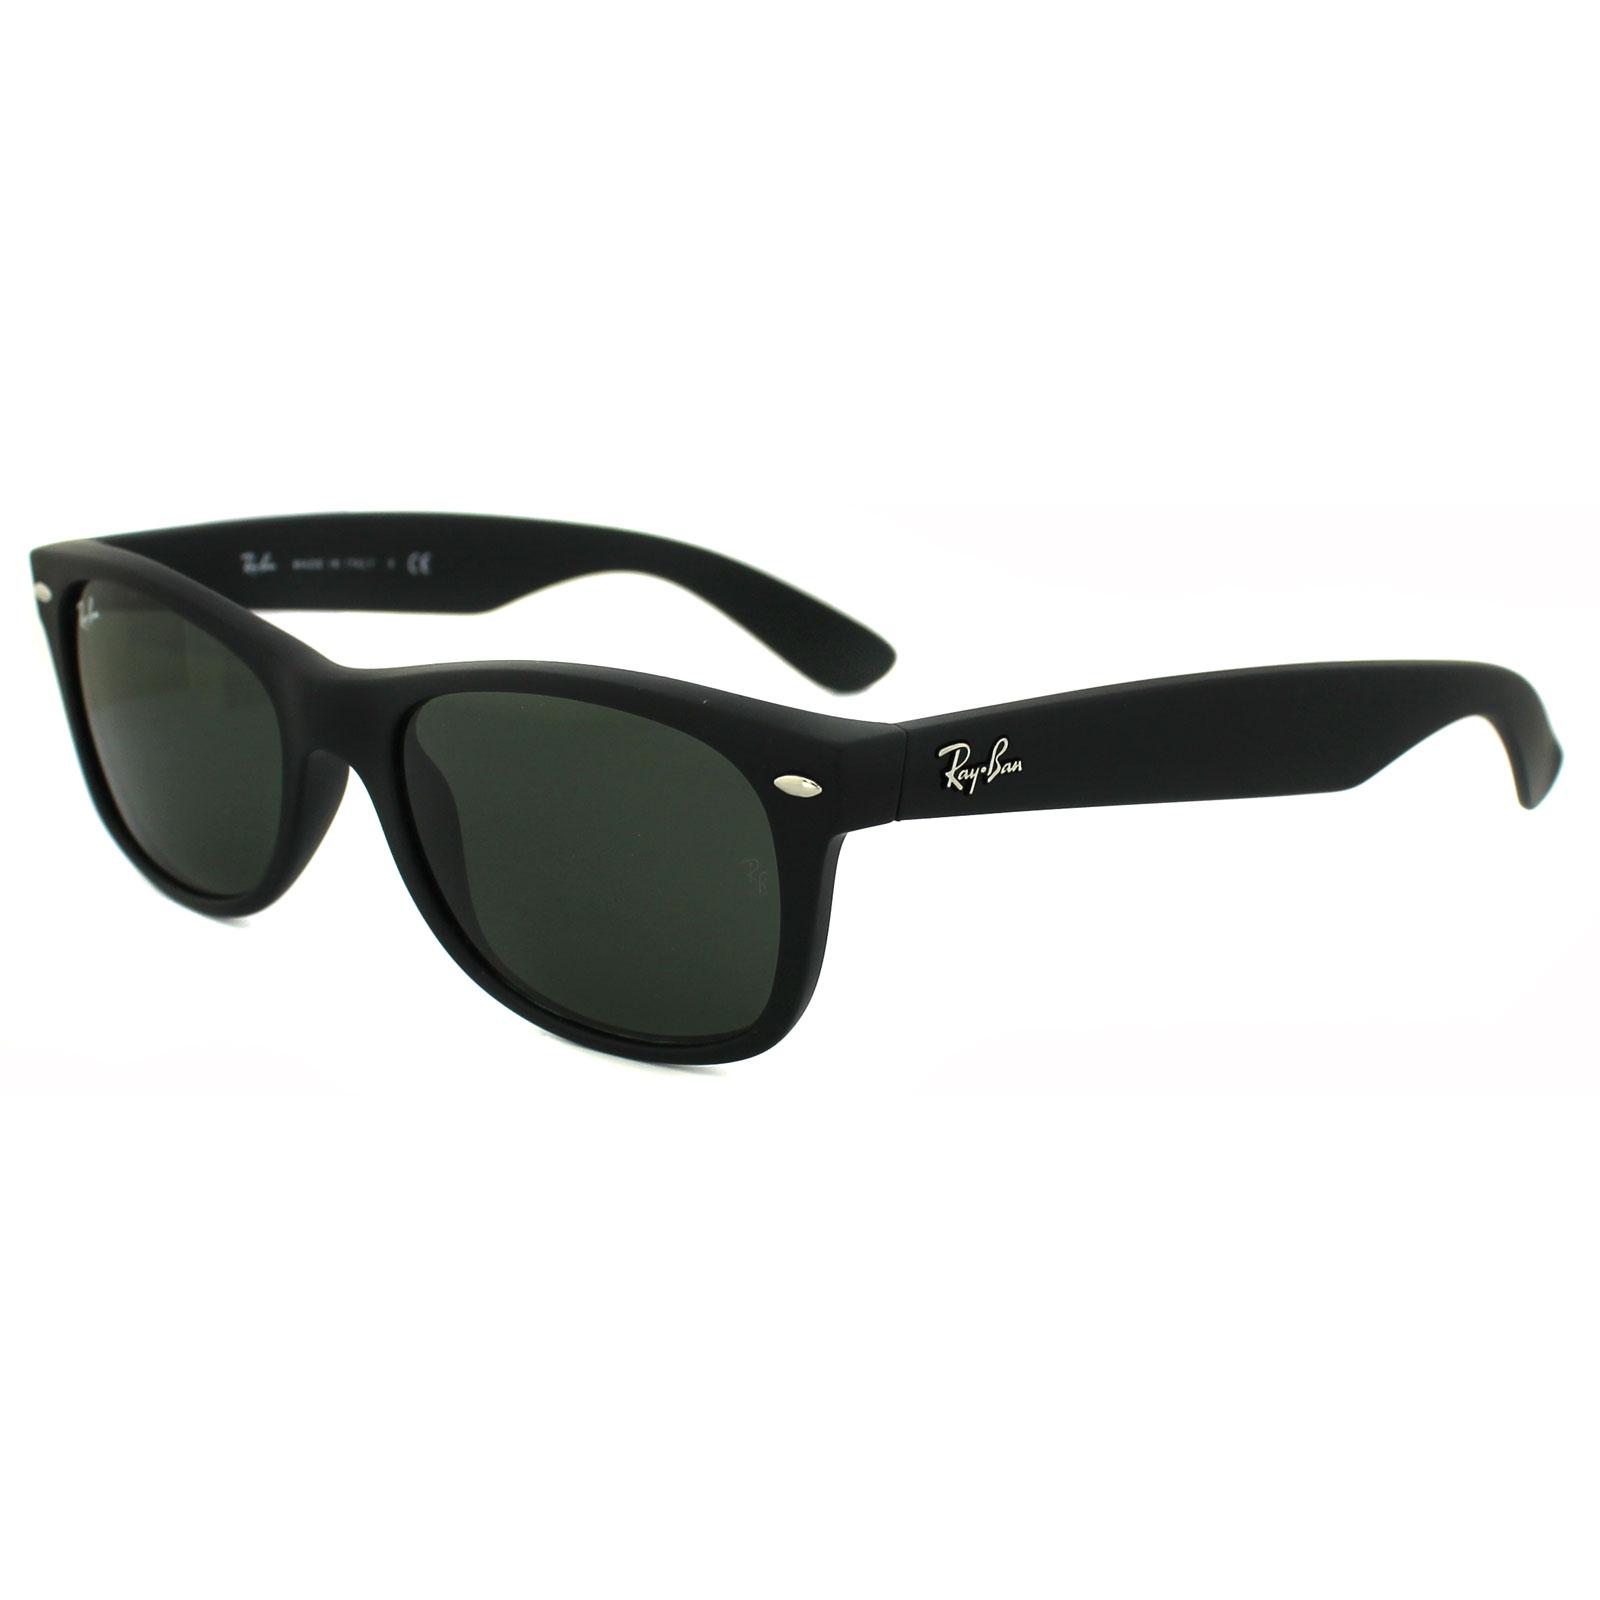 c7484255a Ray-Ban Sunglasses New Wayfarer 2132 622 Black Rubber Green Small 52mm  Thumbnail 1 ...